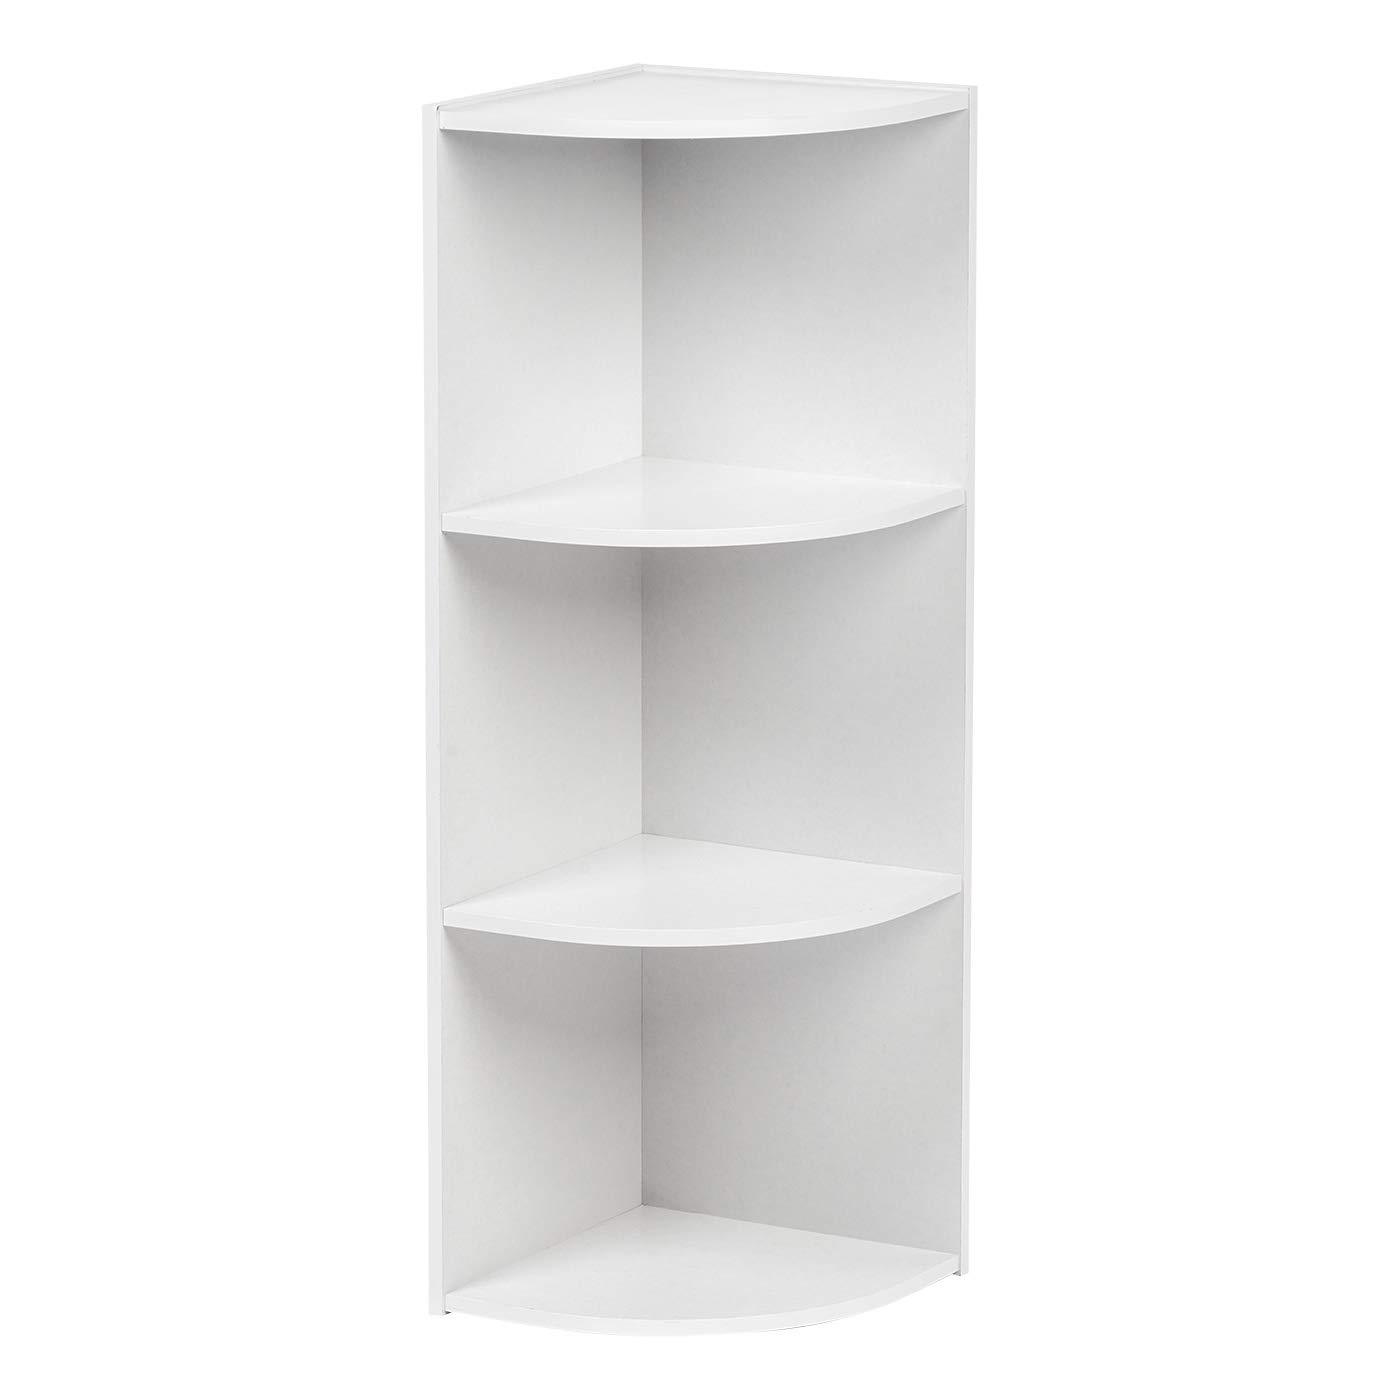 IRIS USA Corner Curved 3-Tier Shelf Organizer, White